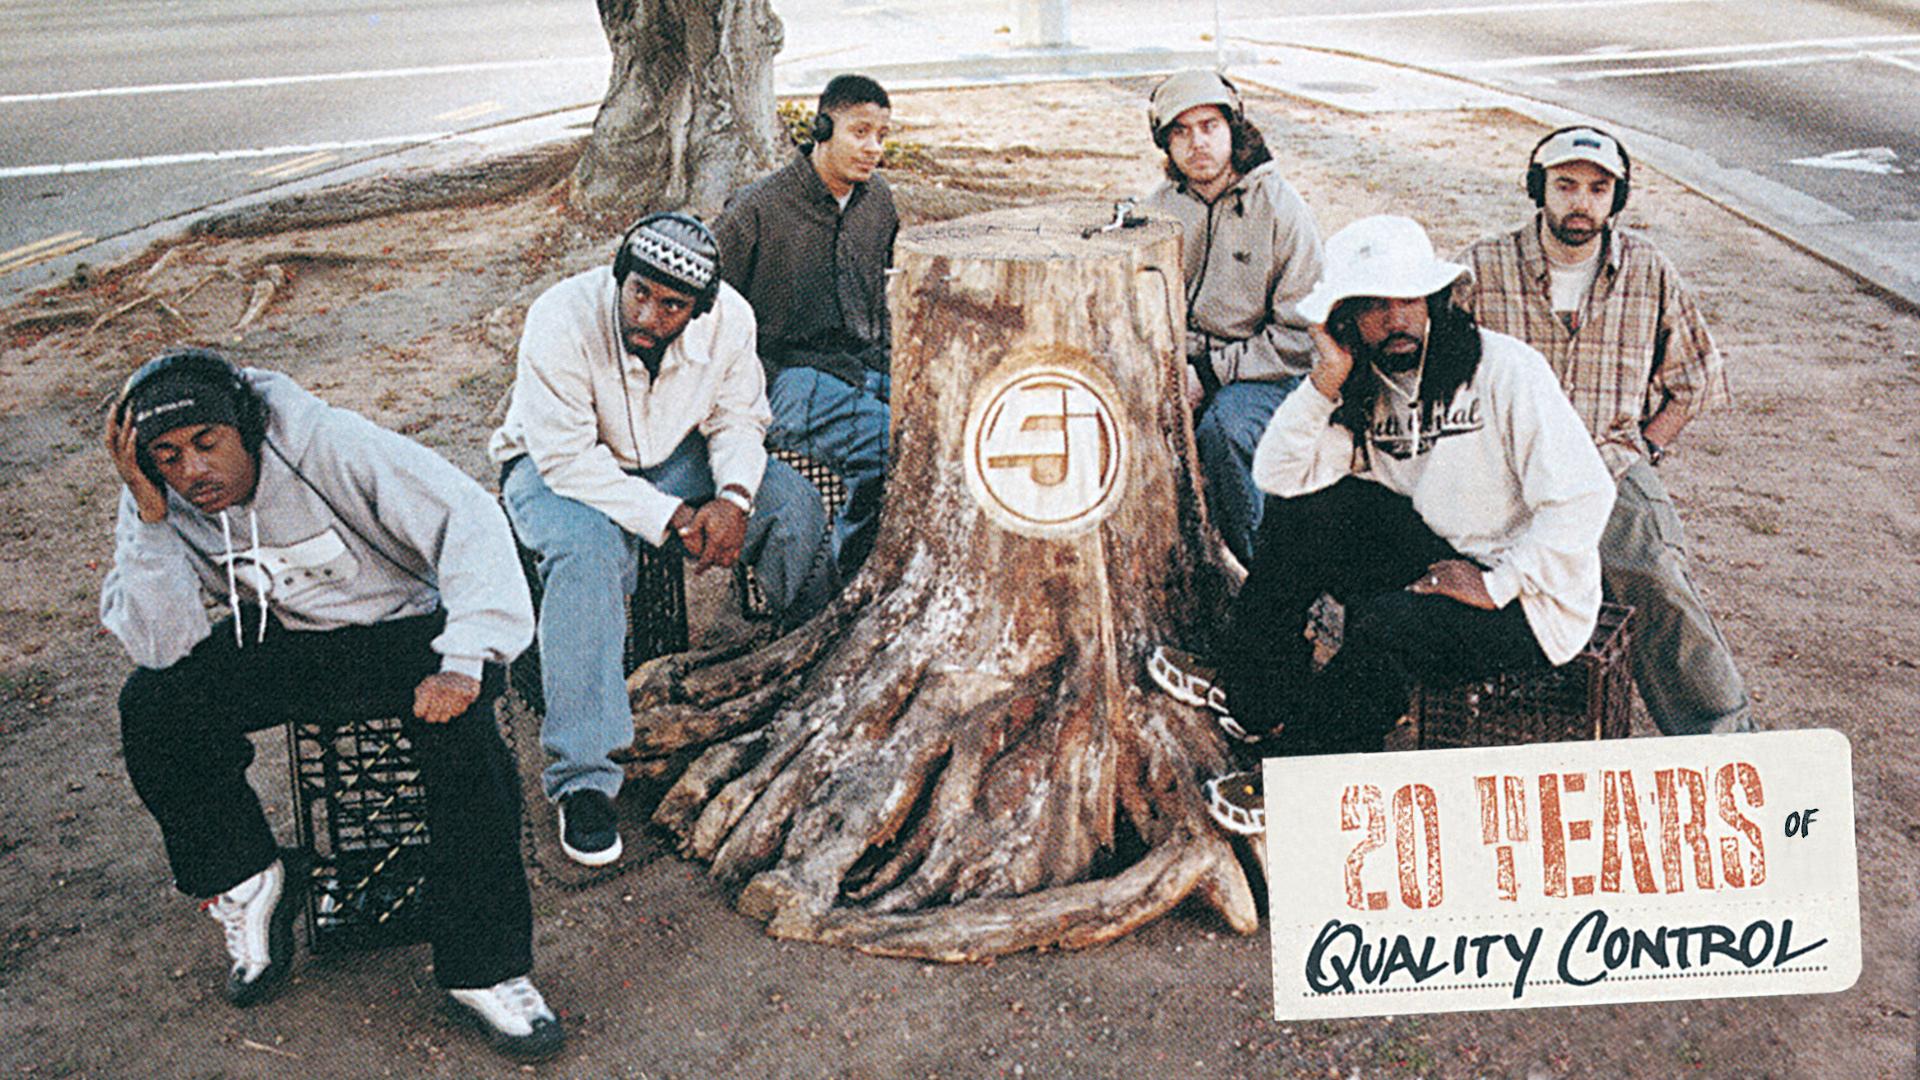 jurassic 5 quality control 20th anniversary